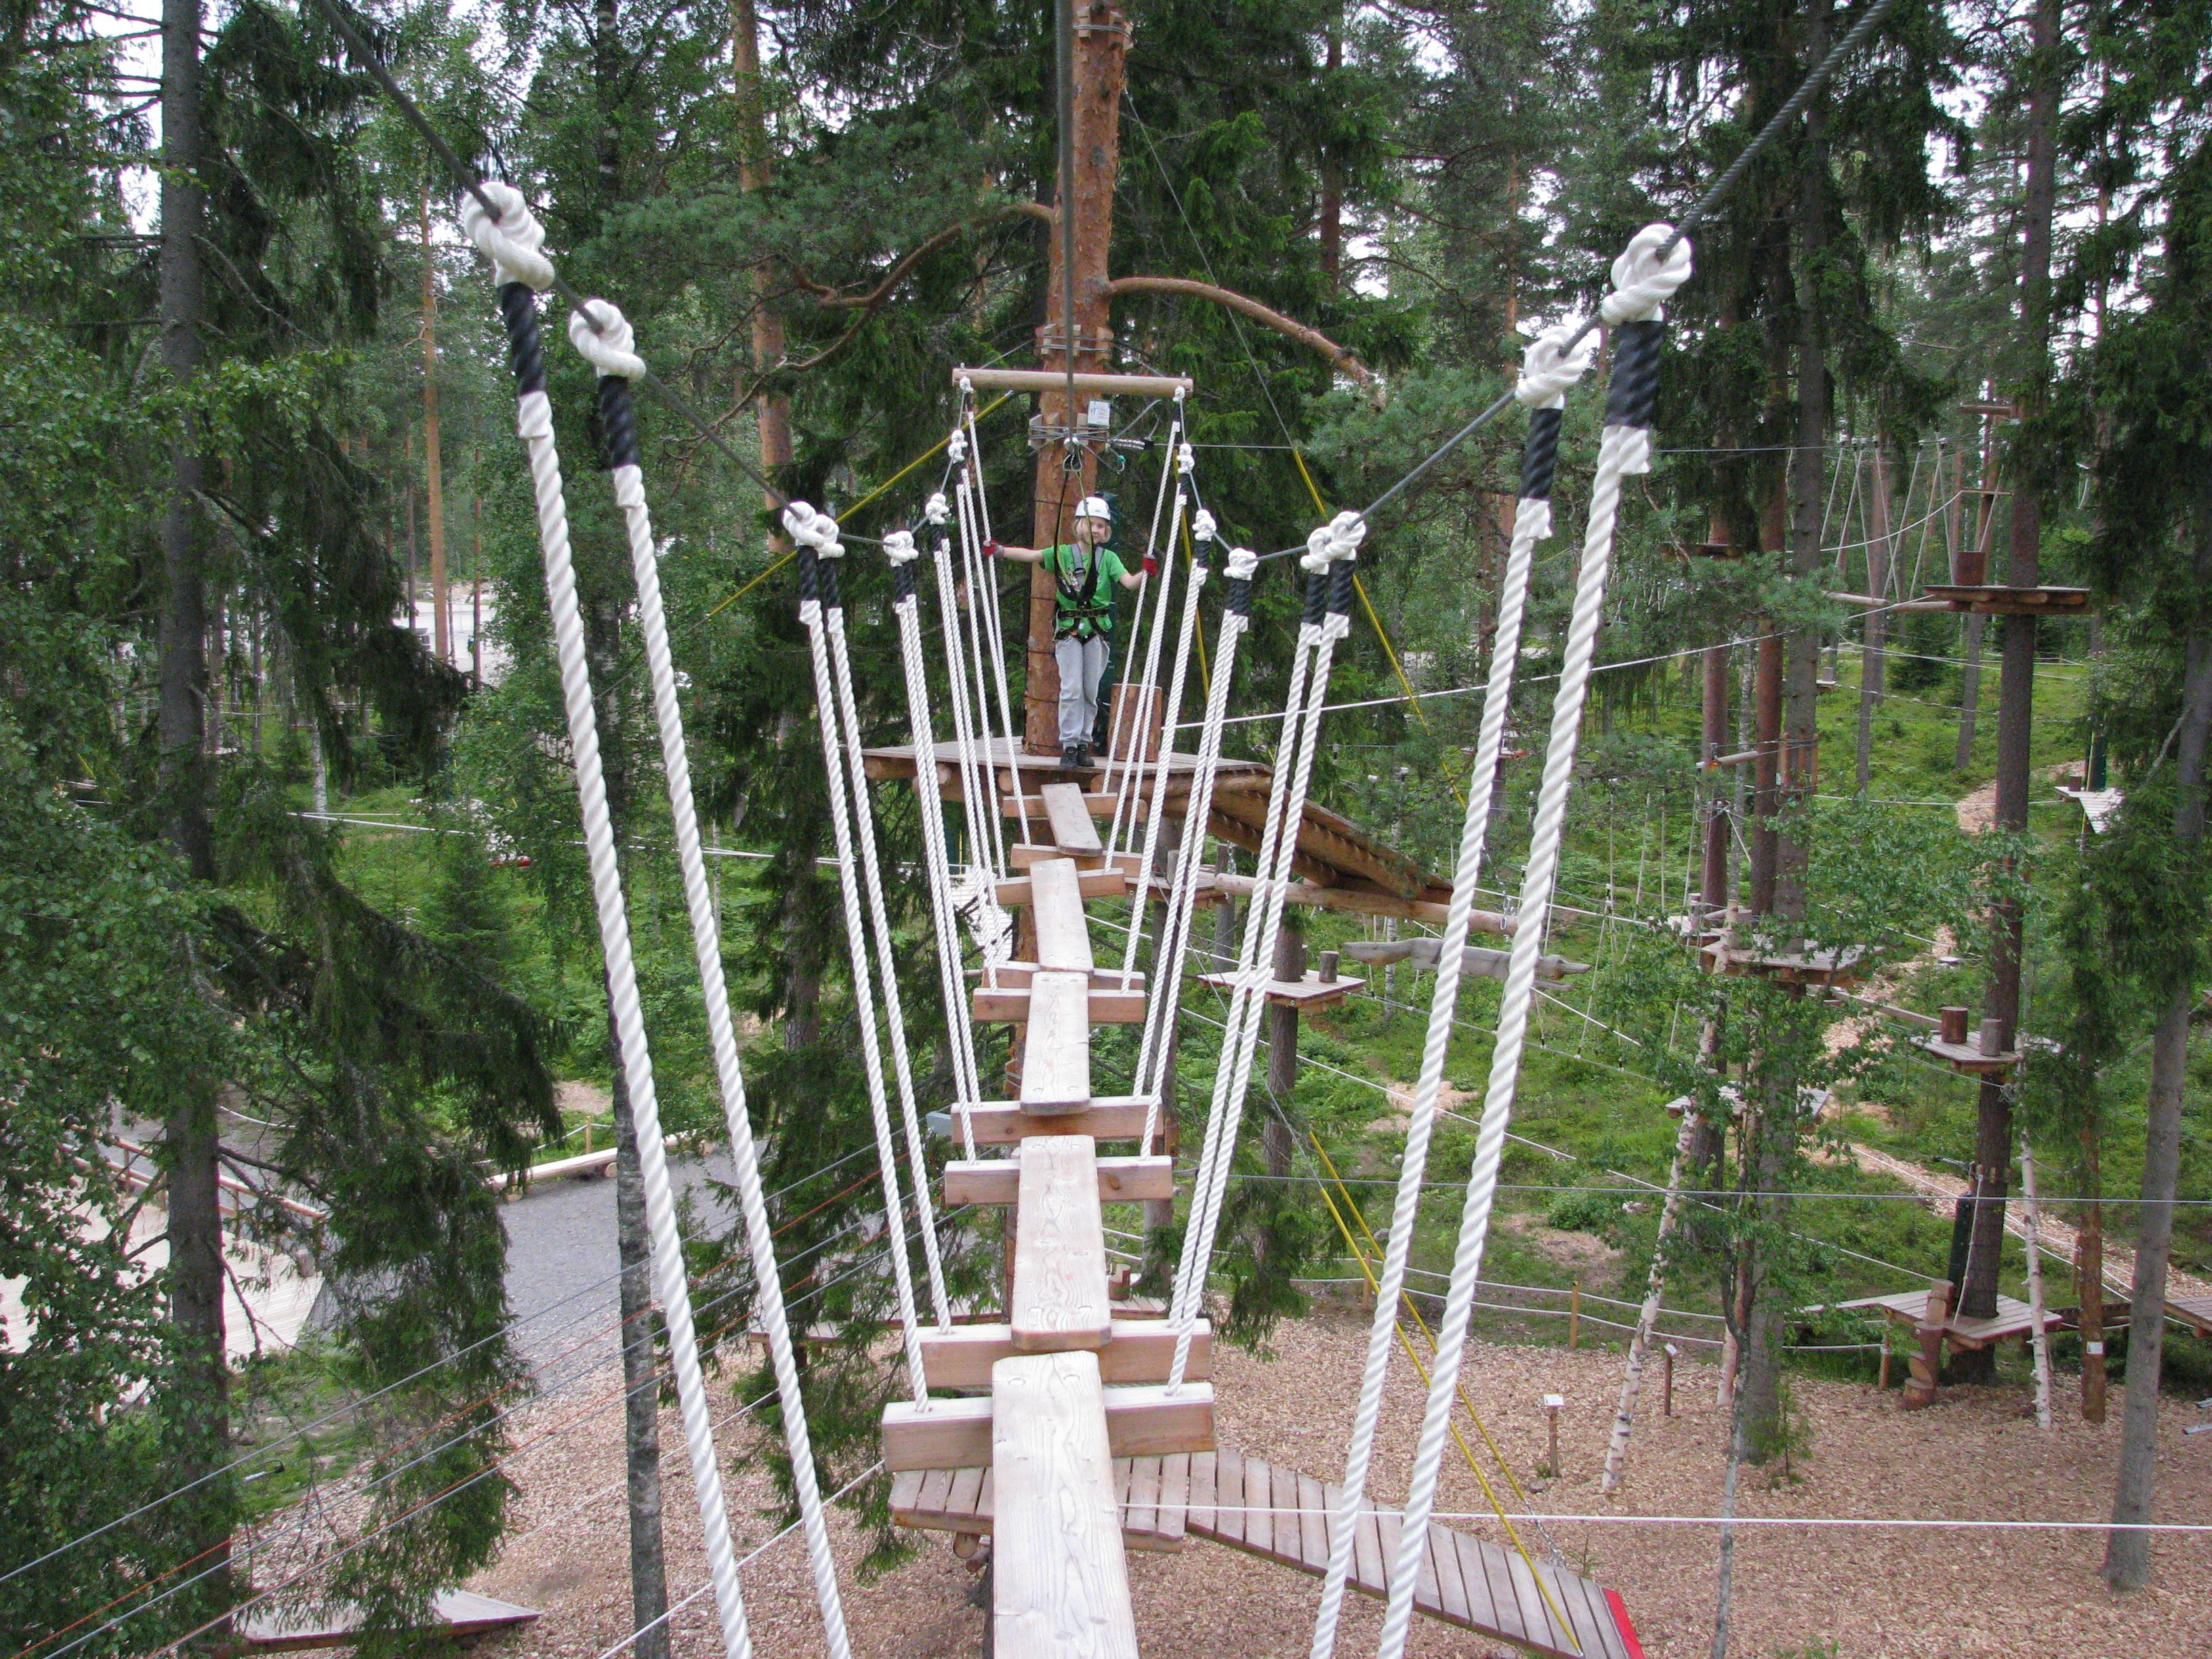 Pajulahden Seikkailupuisto | Pajulahti Adventure Park